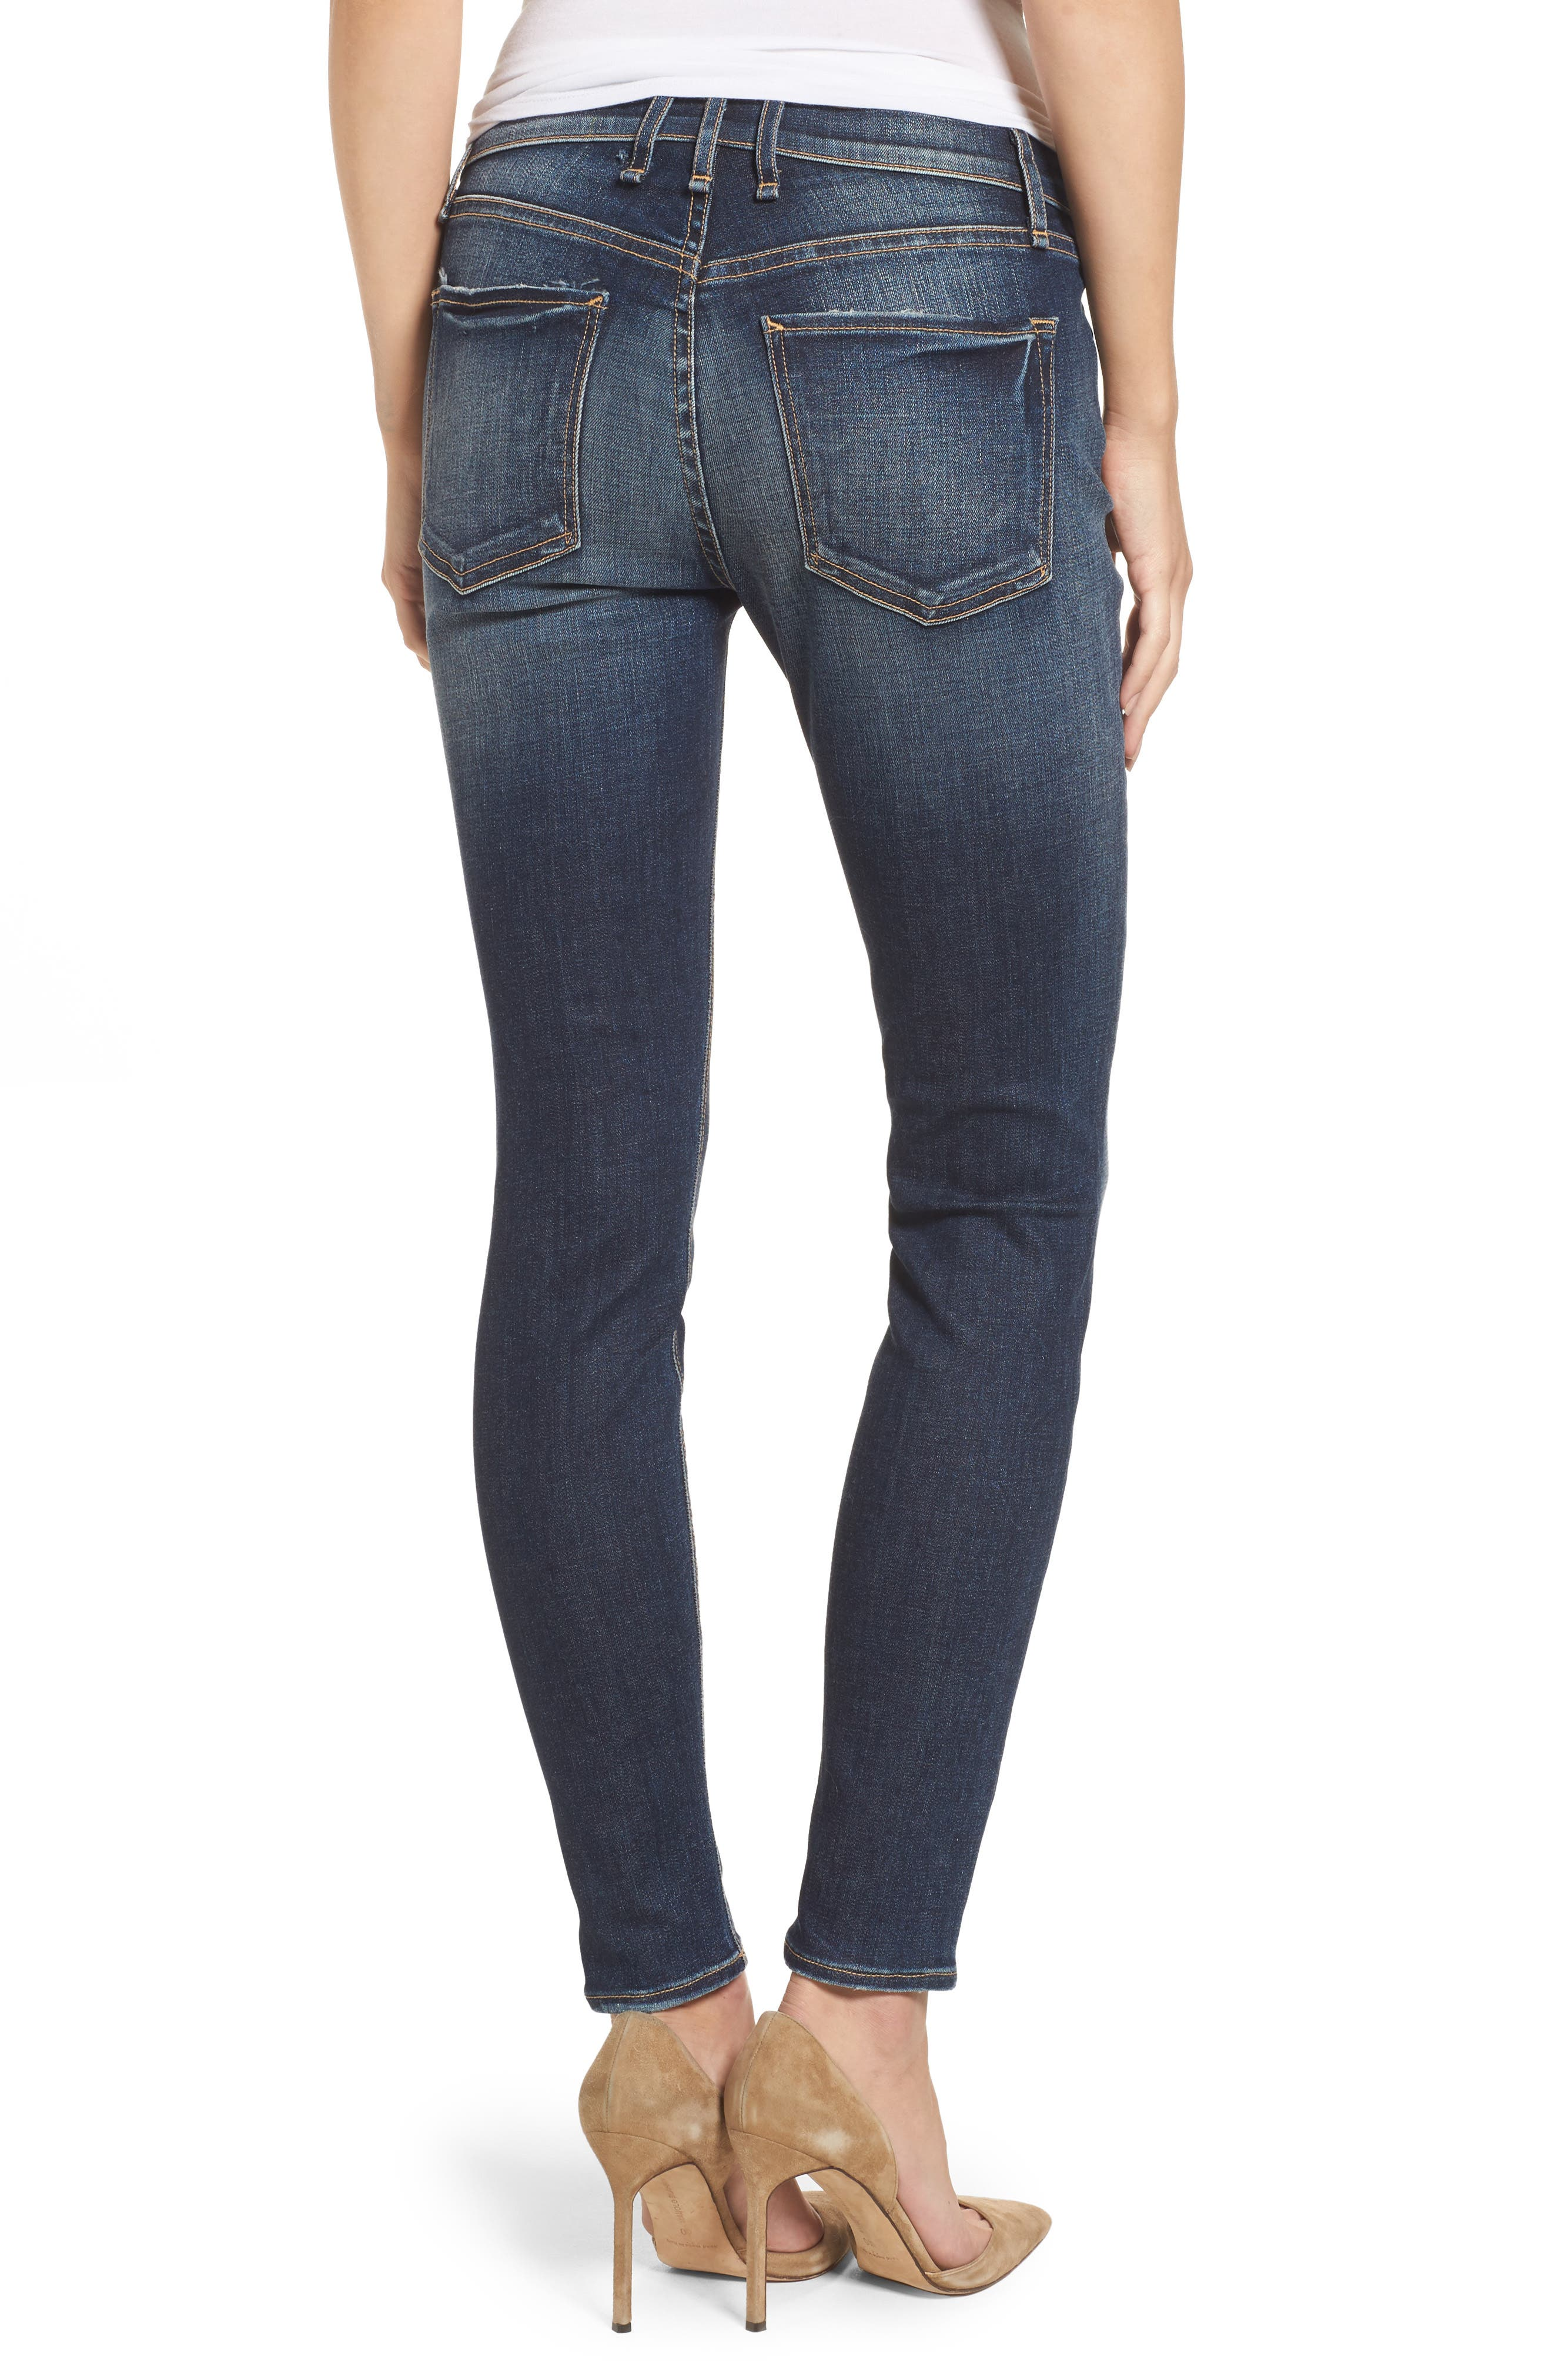 Alternate Image 2  - McGuire Newton High Waist Skinny Jeans (One Thousand Suns)